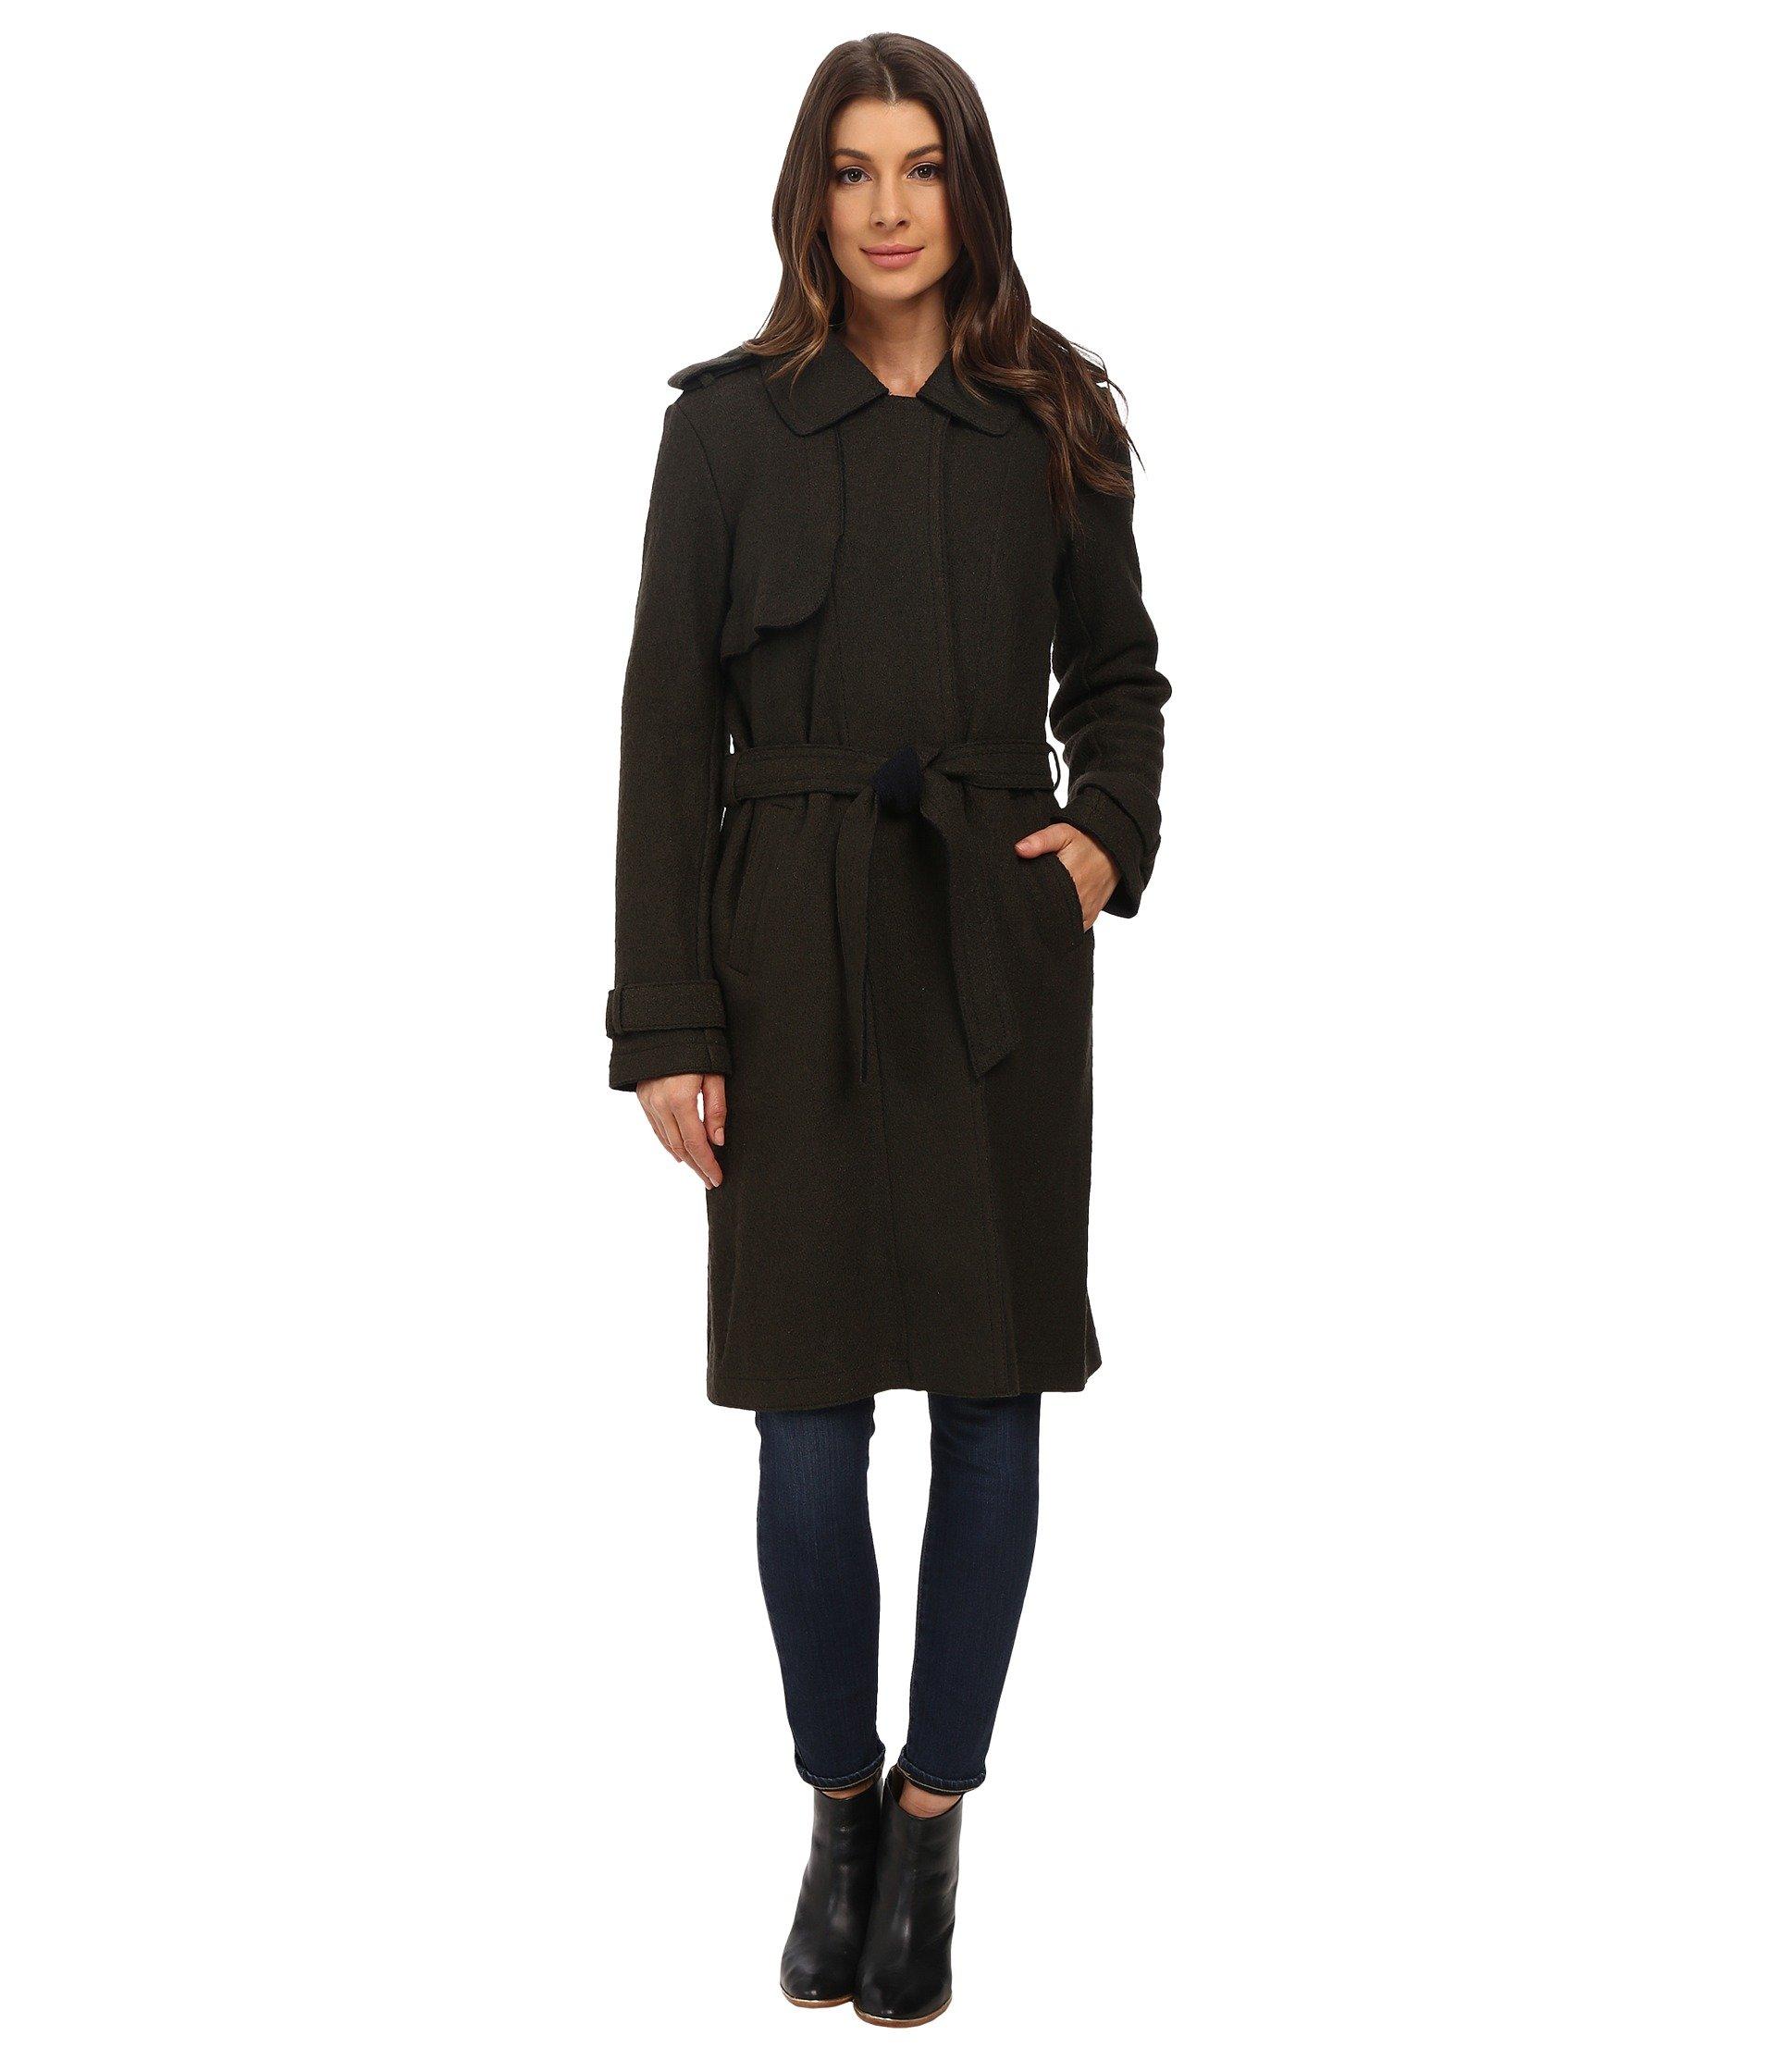 quilted lyne clothing outerwear hi vince coat faux quilt en melanie down res camuto jacket novelti silver